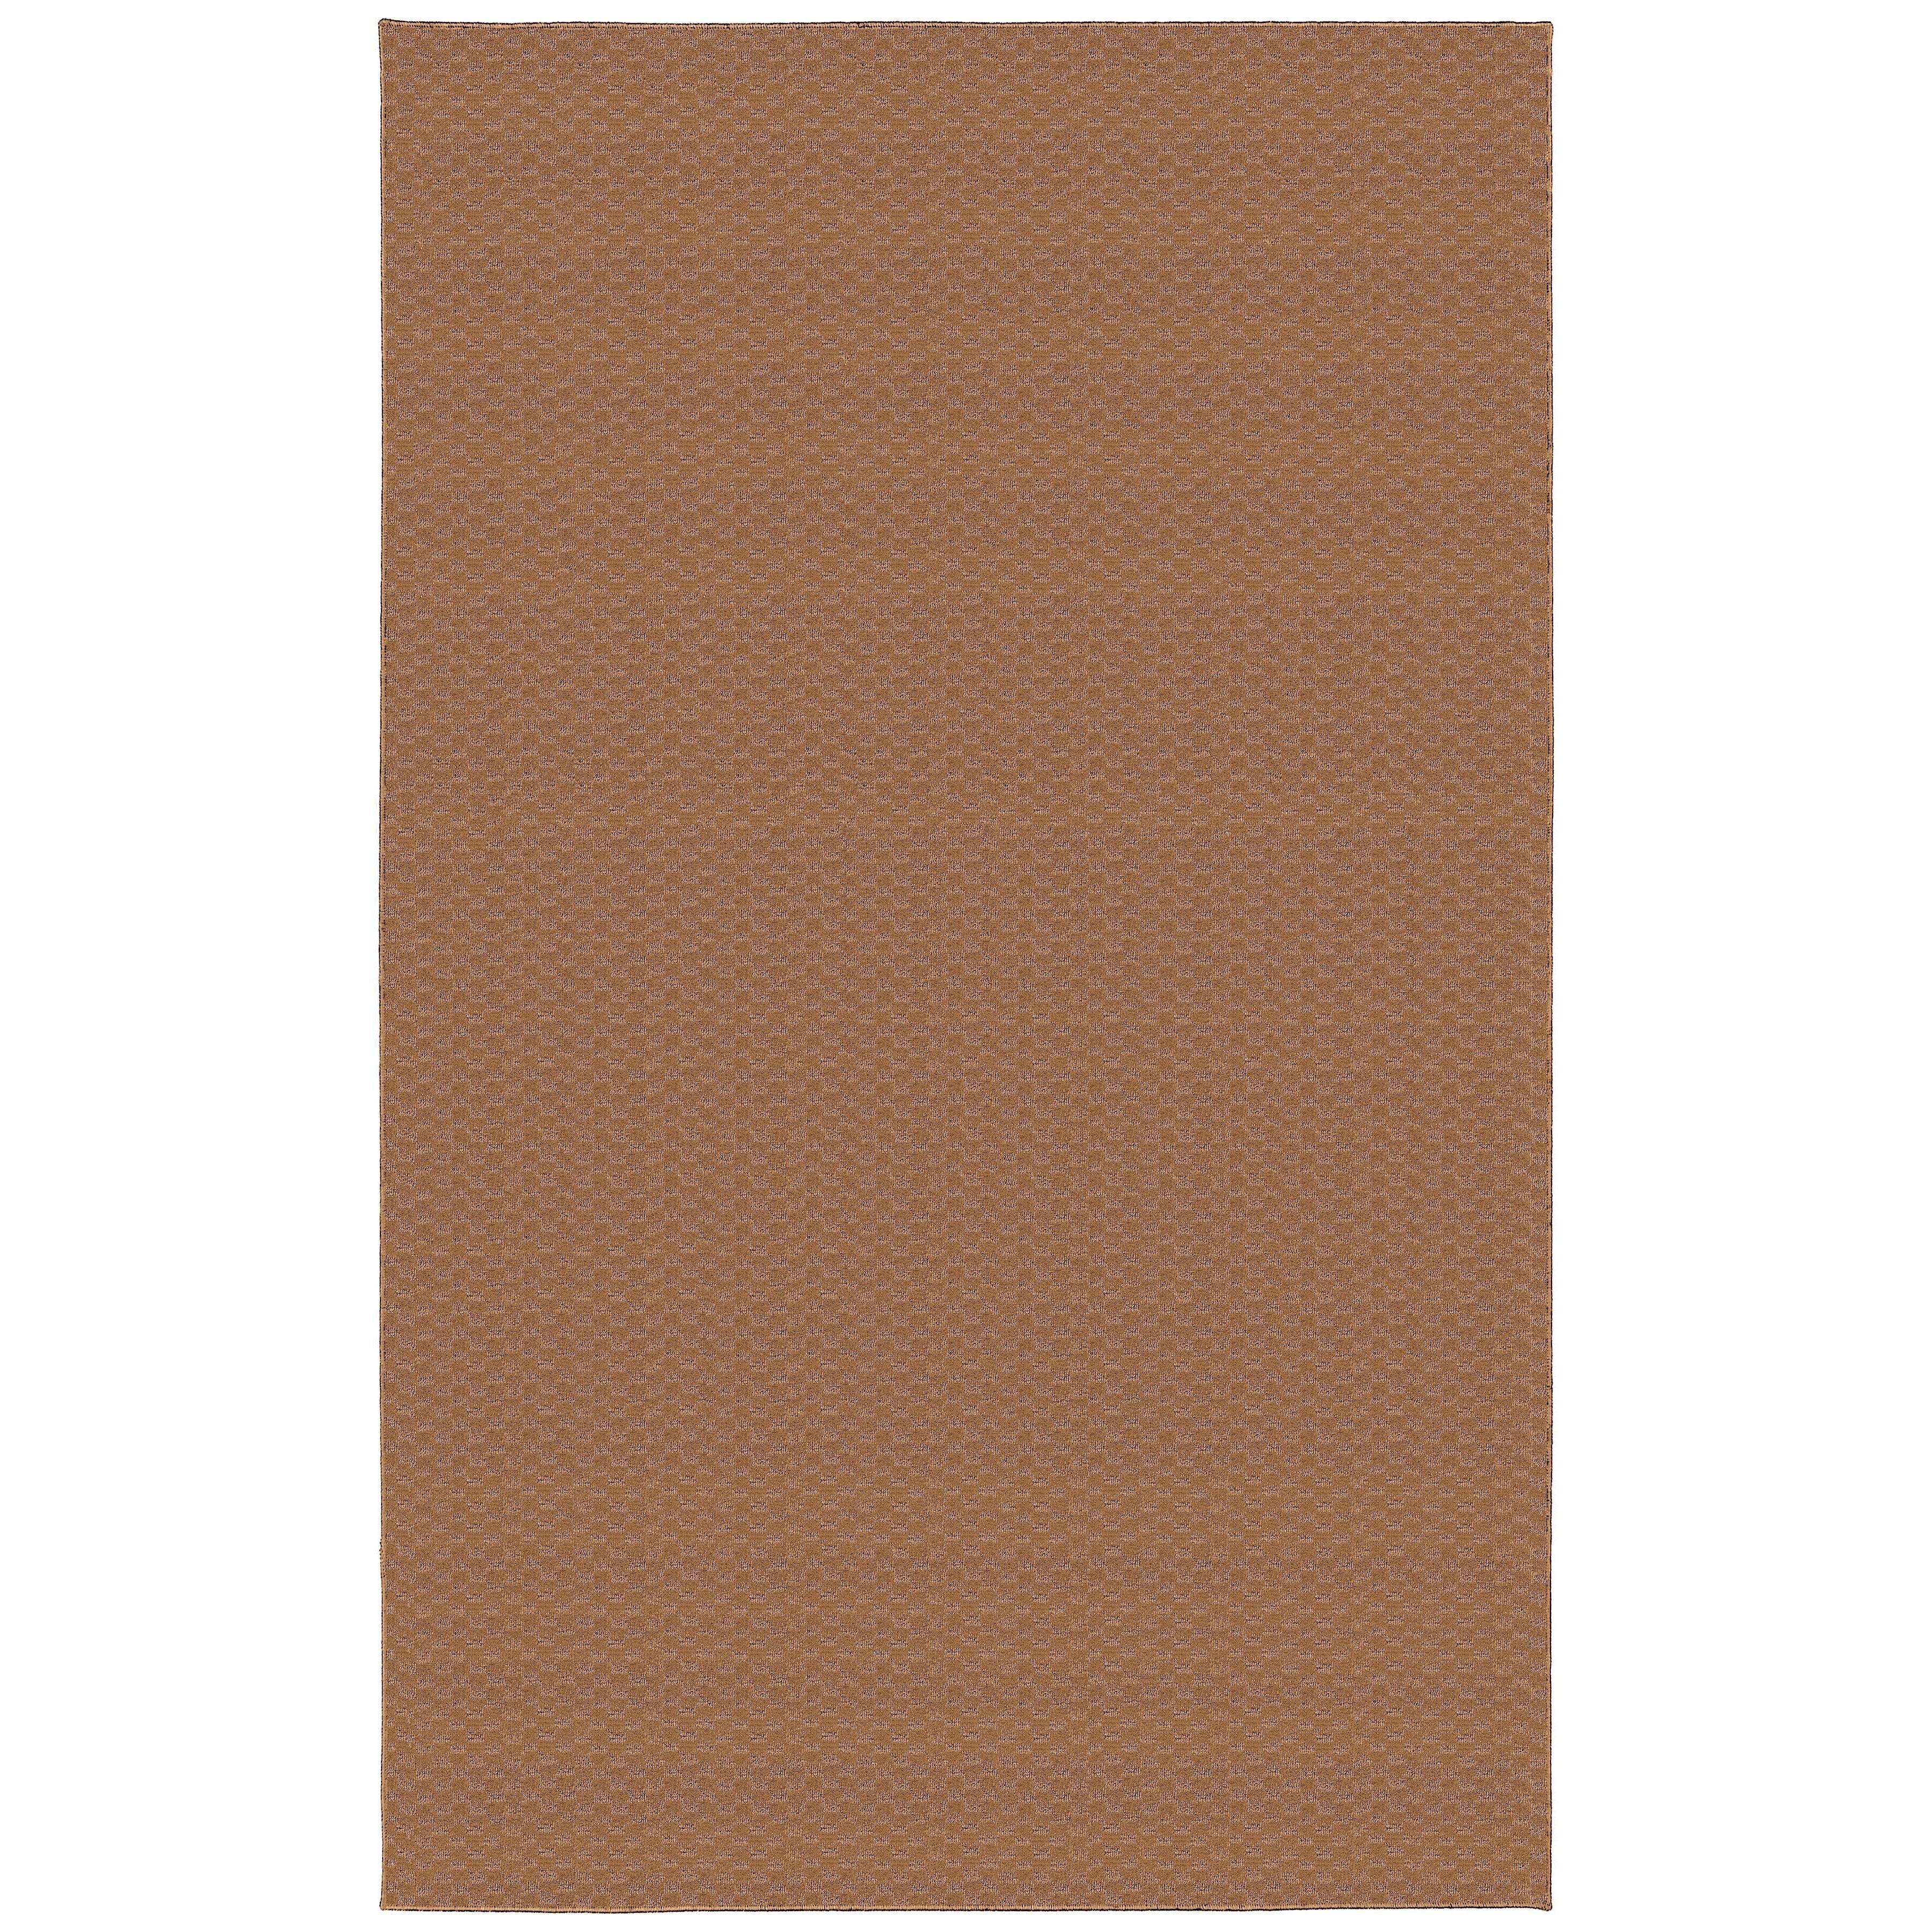 Garland rug medallion tan rug reviews wayfair Home furniture and rugs garland